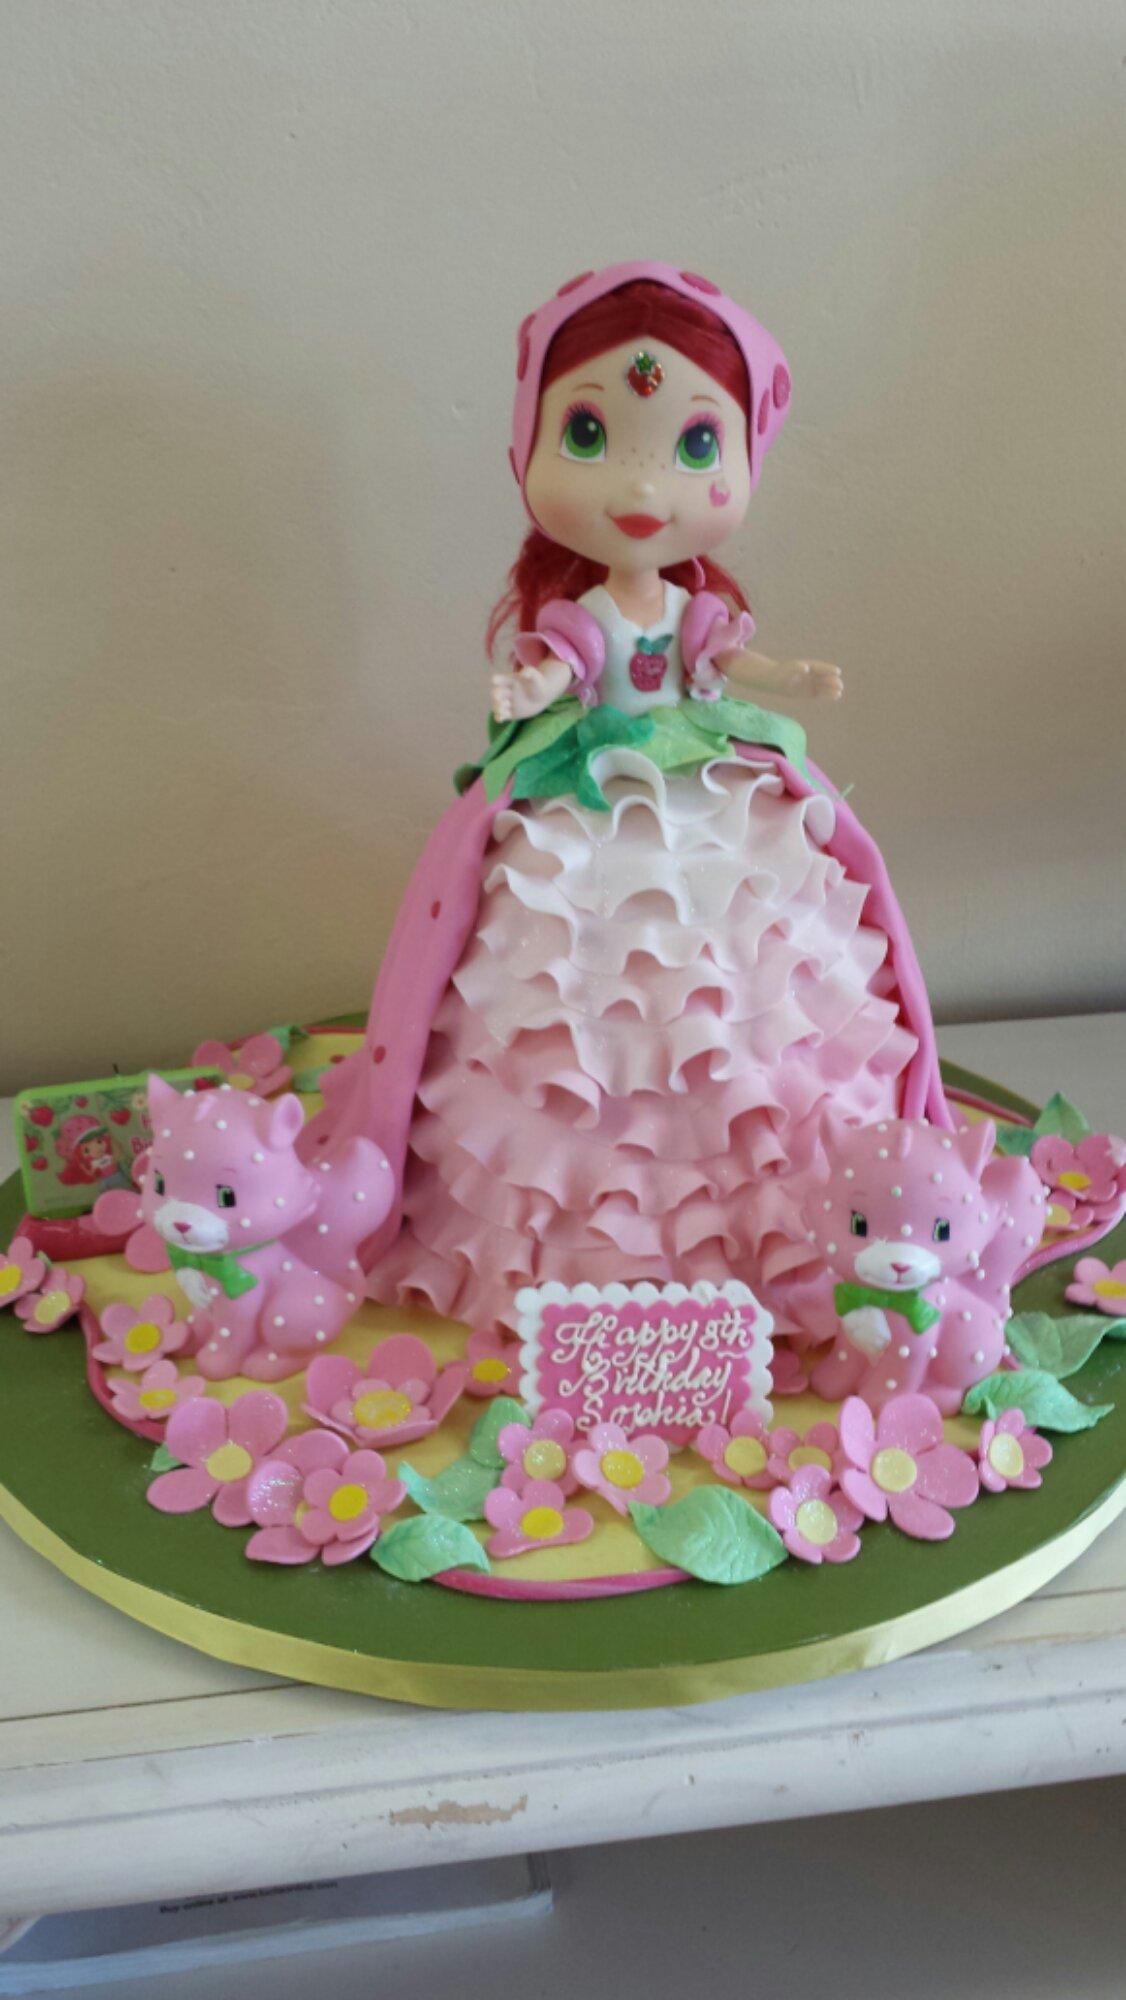 Cake Designs Pembroke Pines : Sweet Art by Lucila   Heaven in a cake! Edible Reflections